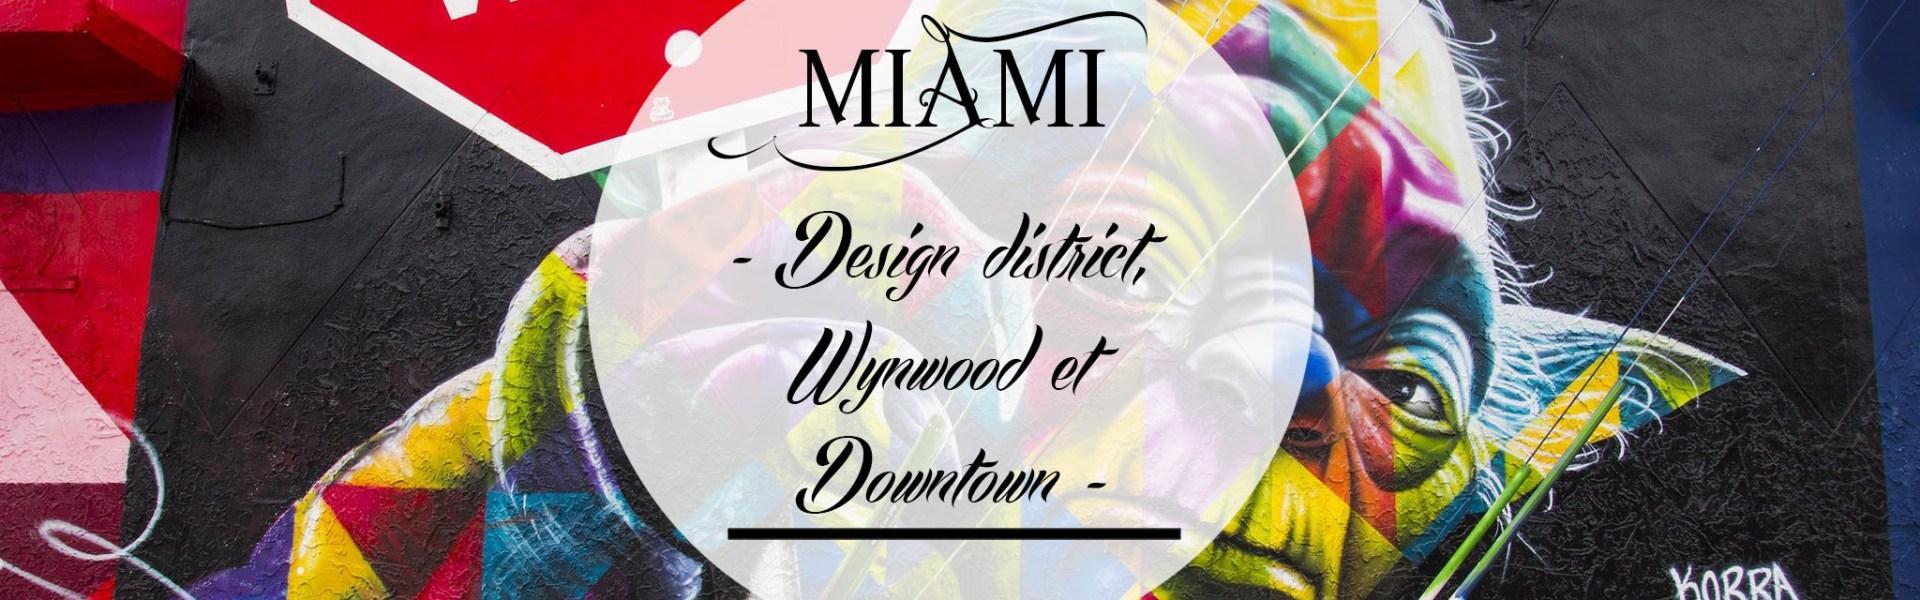 Design district, Wynwood et Downtown